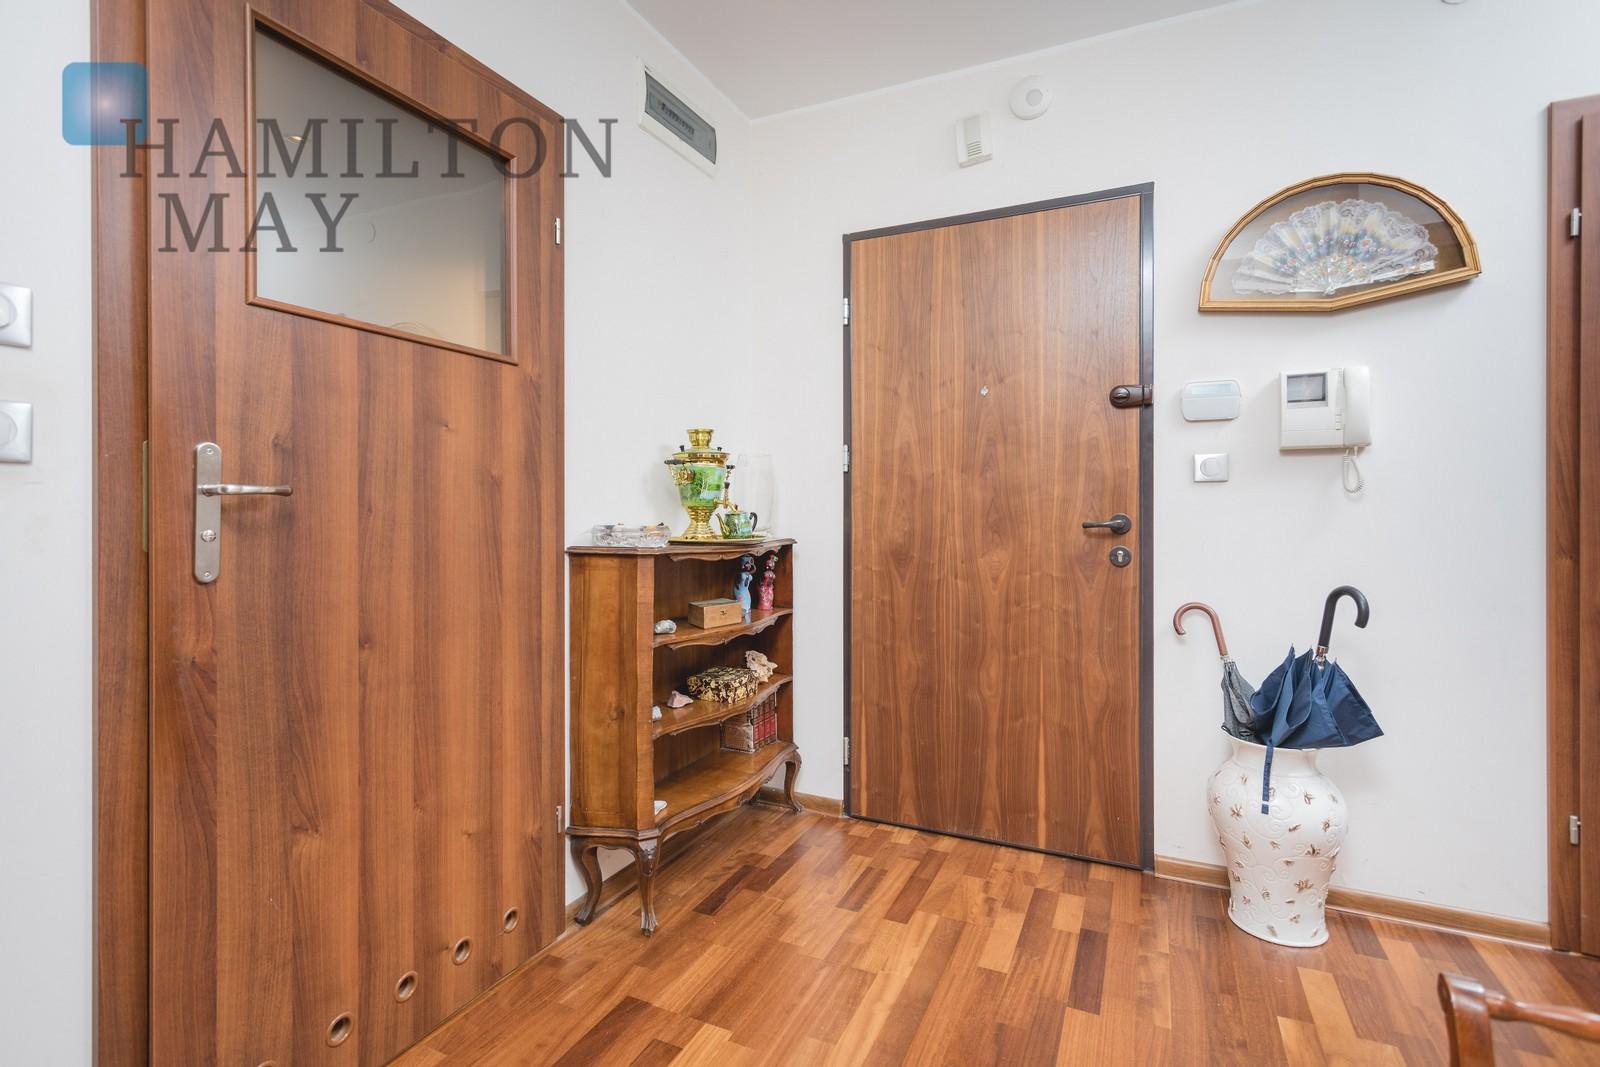 For sale a 3-bedroom apartment with private garden - Os. Eldorado Krakow for sale